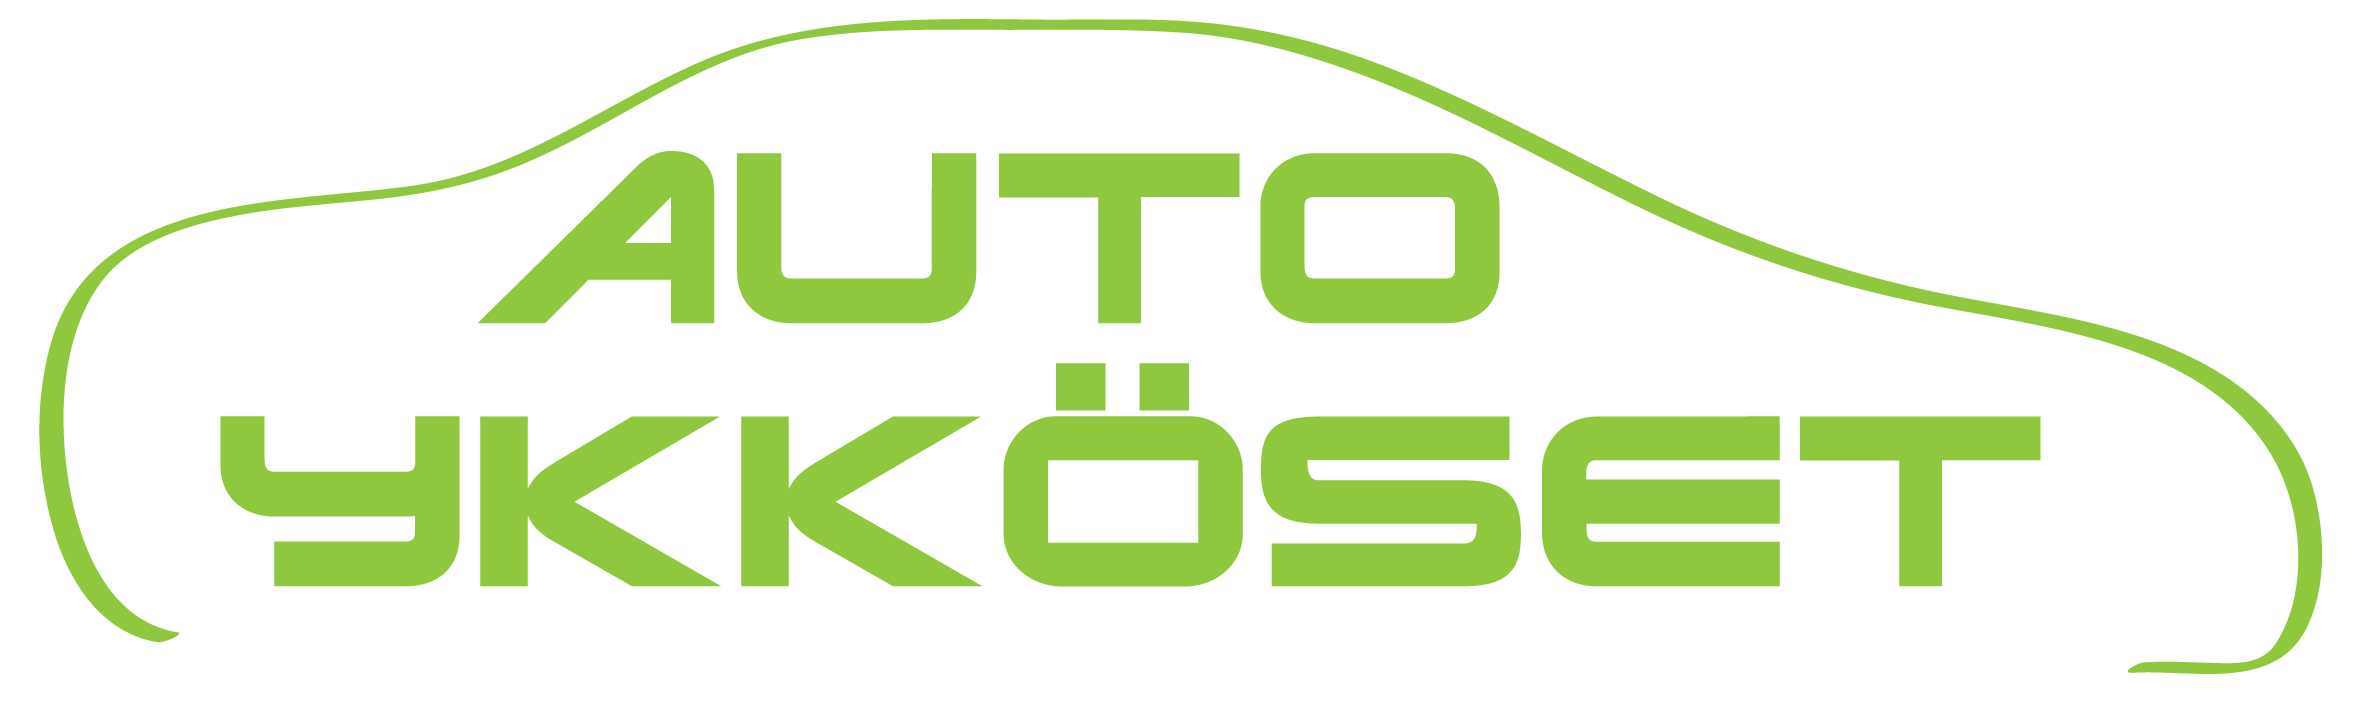 autoykkoset logo superfinal outline.png